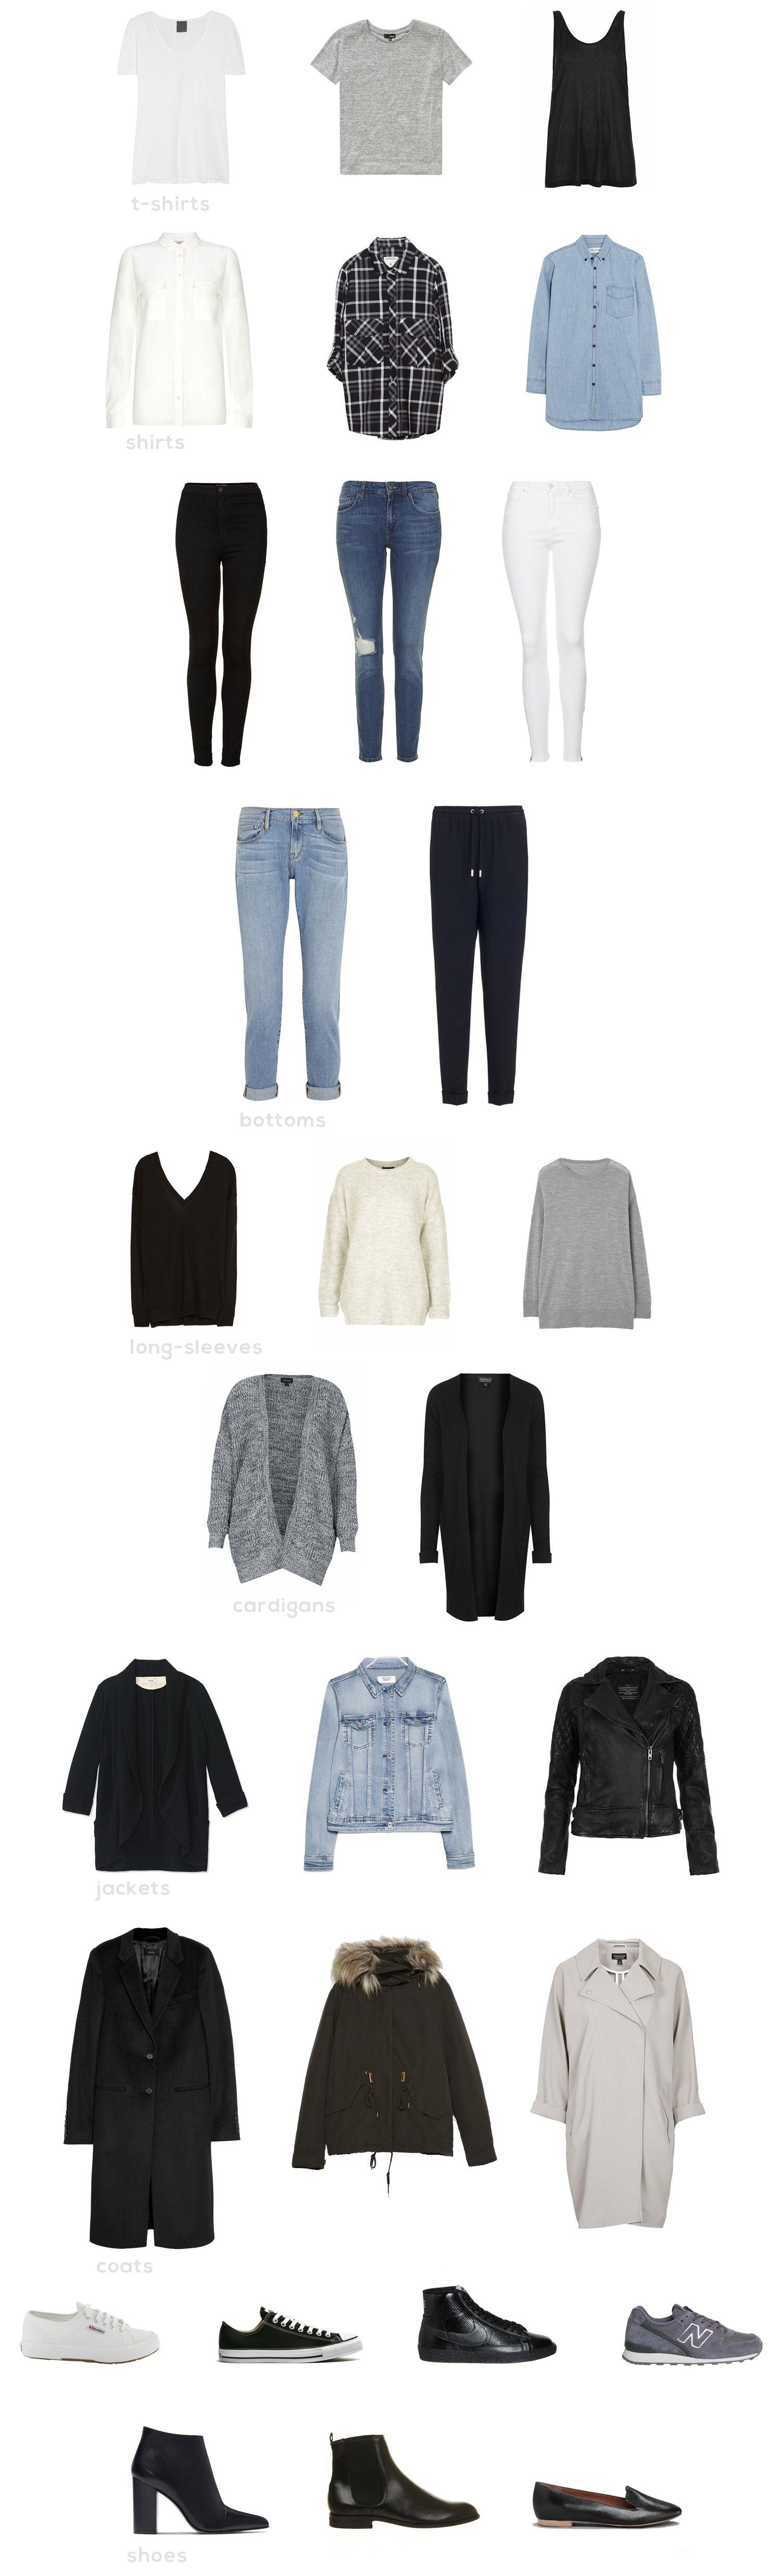 A Capsule Wardrobe The Basics